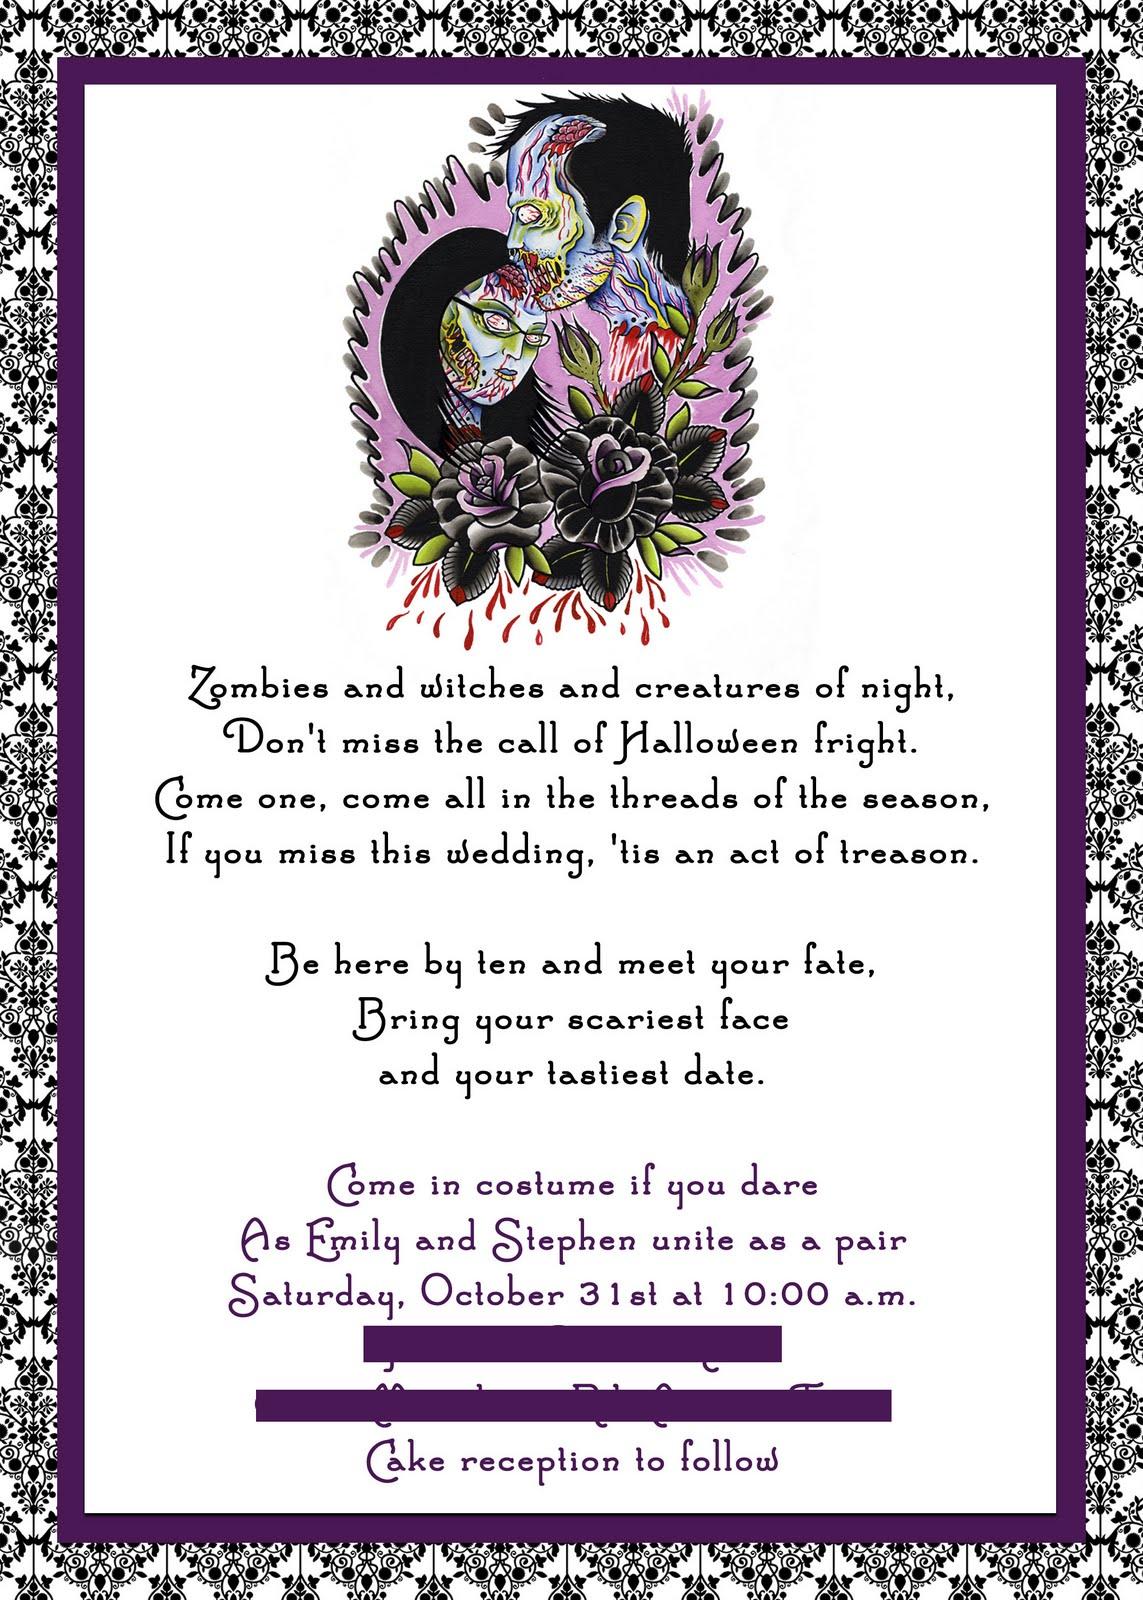 Westwind Days Emilys Halloween Wedding Invitation